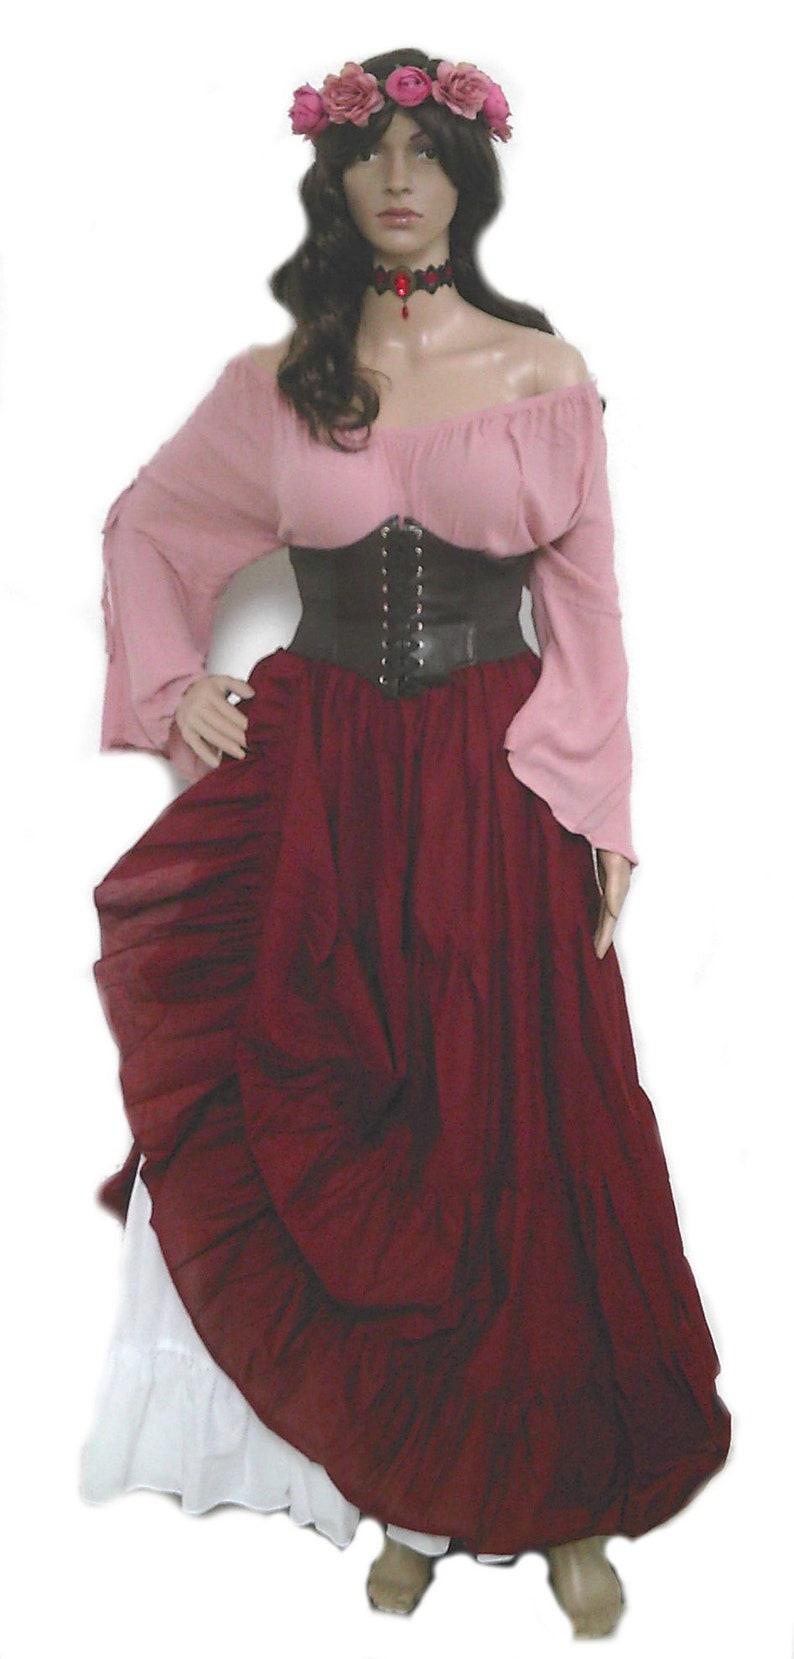 bceb5ad84 Plus Renaissance Dress Corset Skirt Chemise Wench Pirate